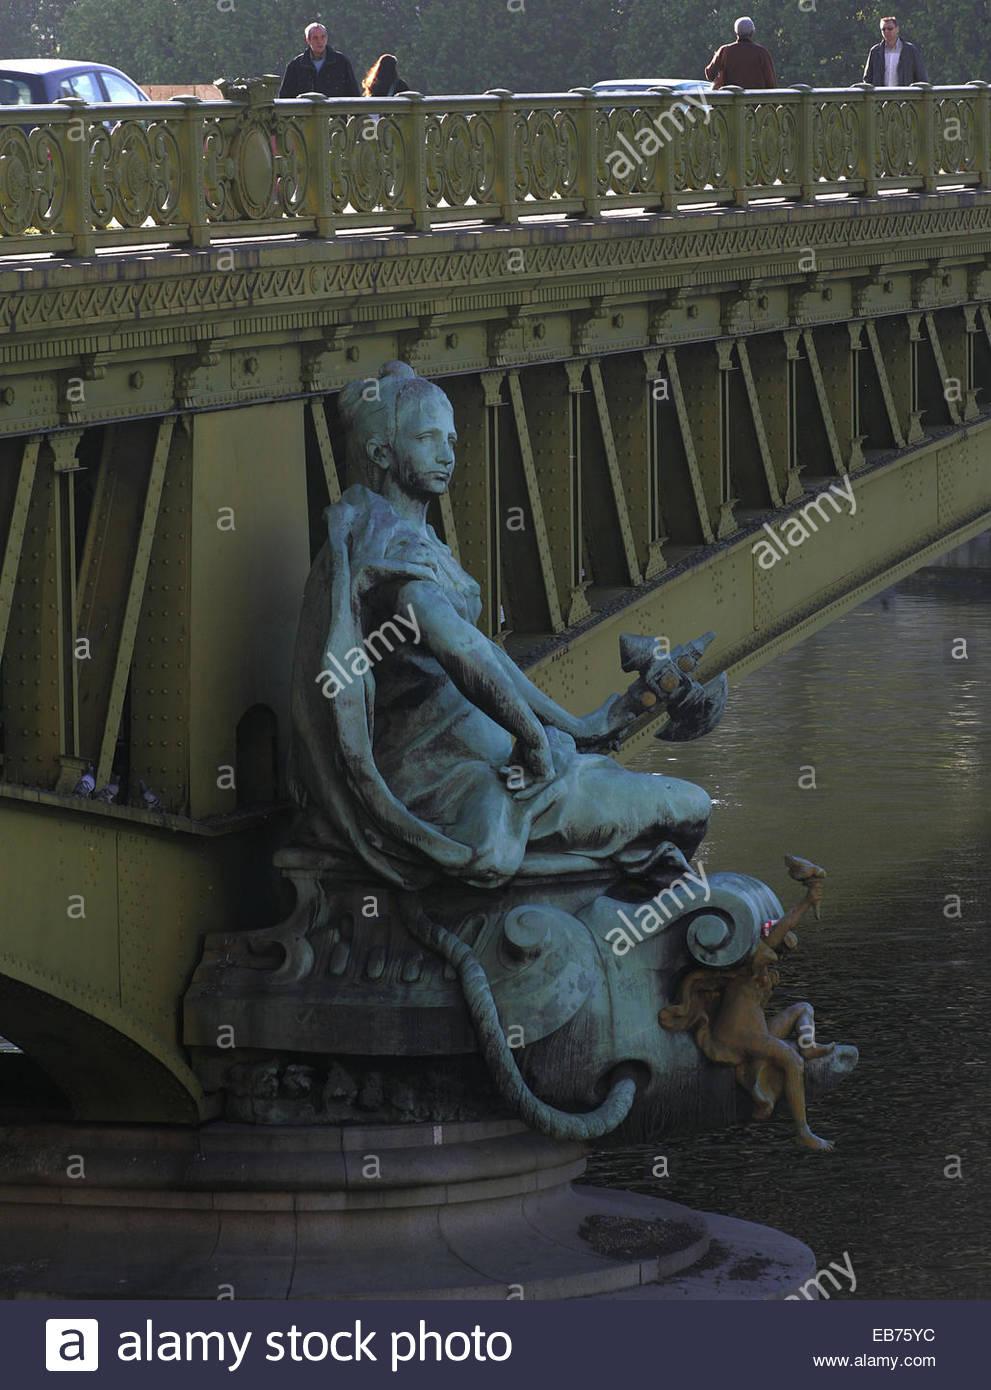 Statue on Mirabeau bridge, Paris. - Stock Image